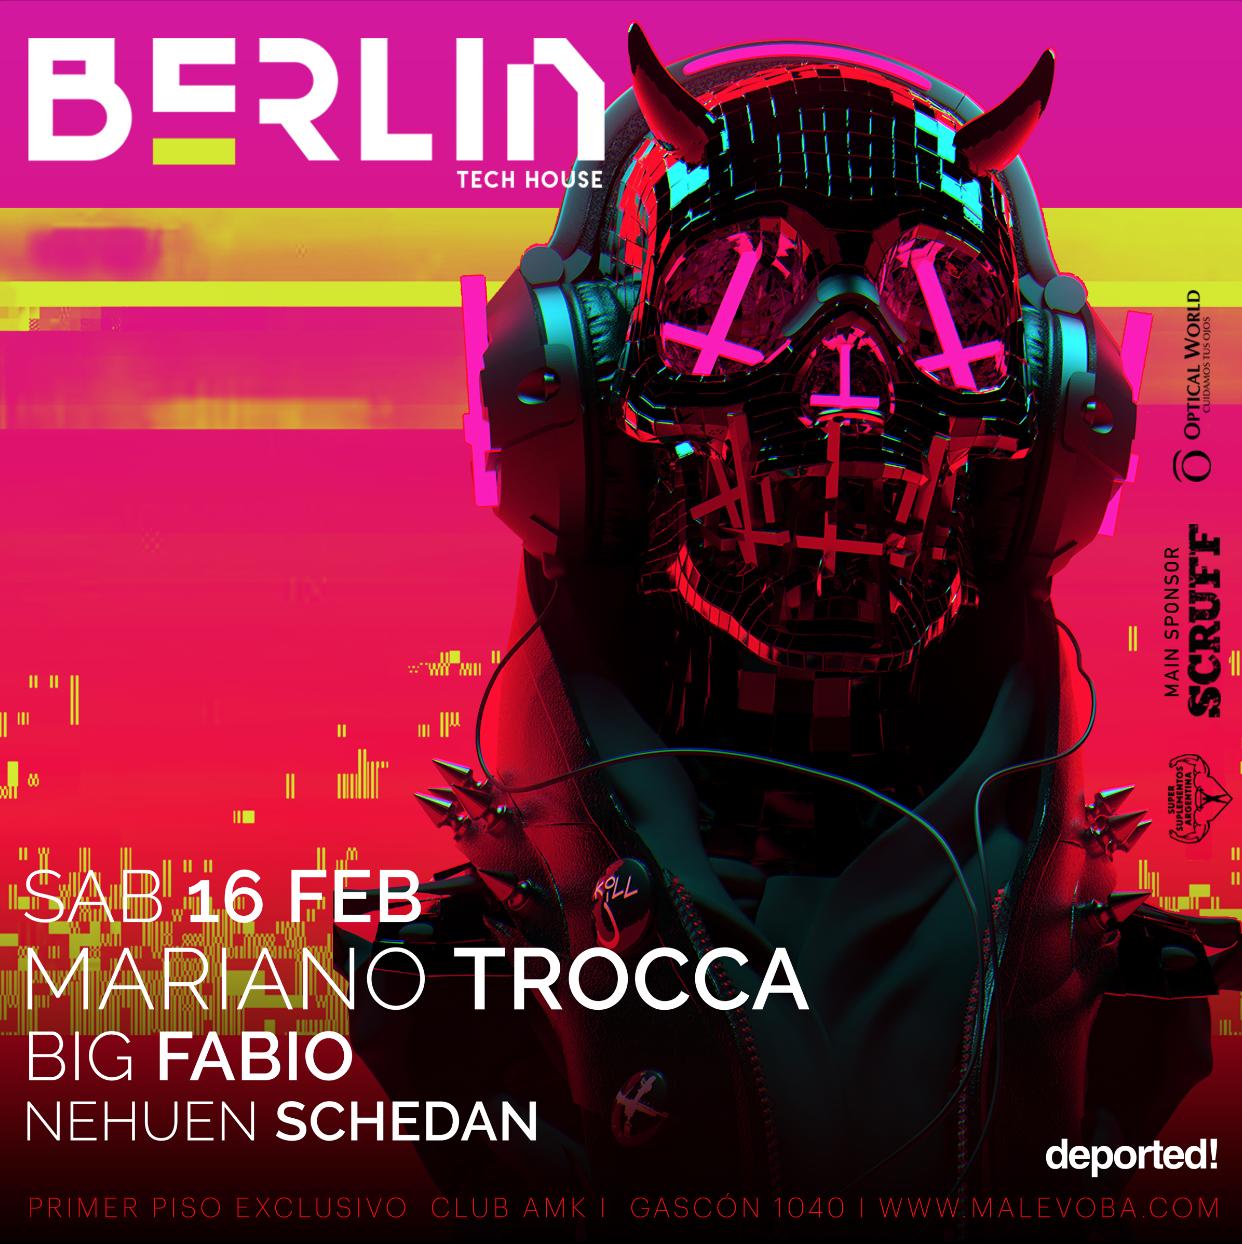 Berlin III 16 FEB